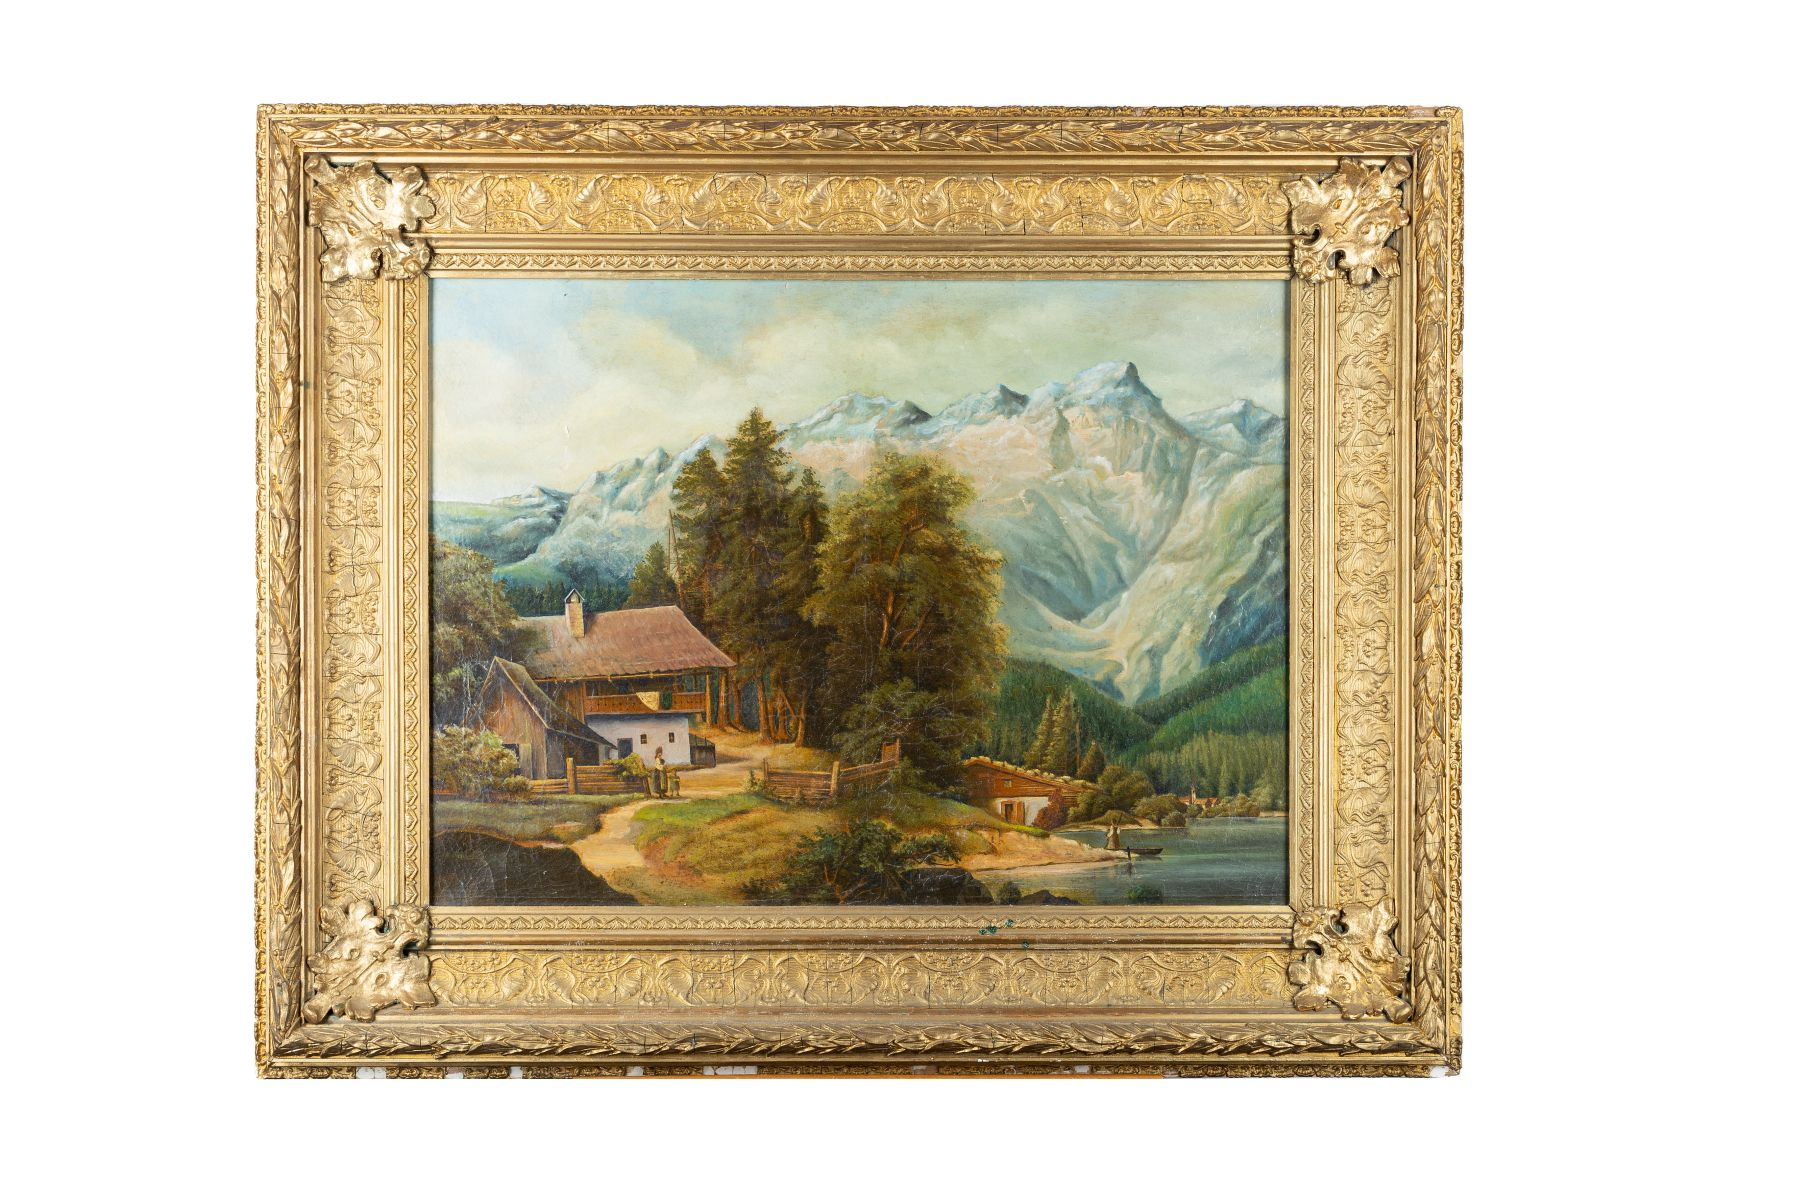 #29 Decorative oil painting |Dekoratives Ölbild Image